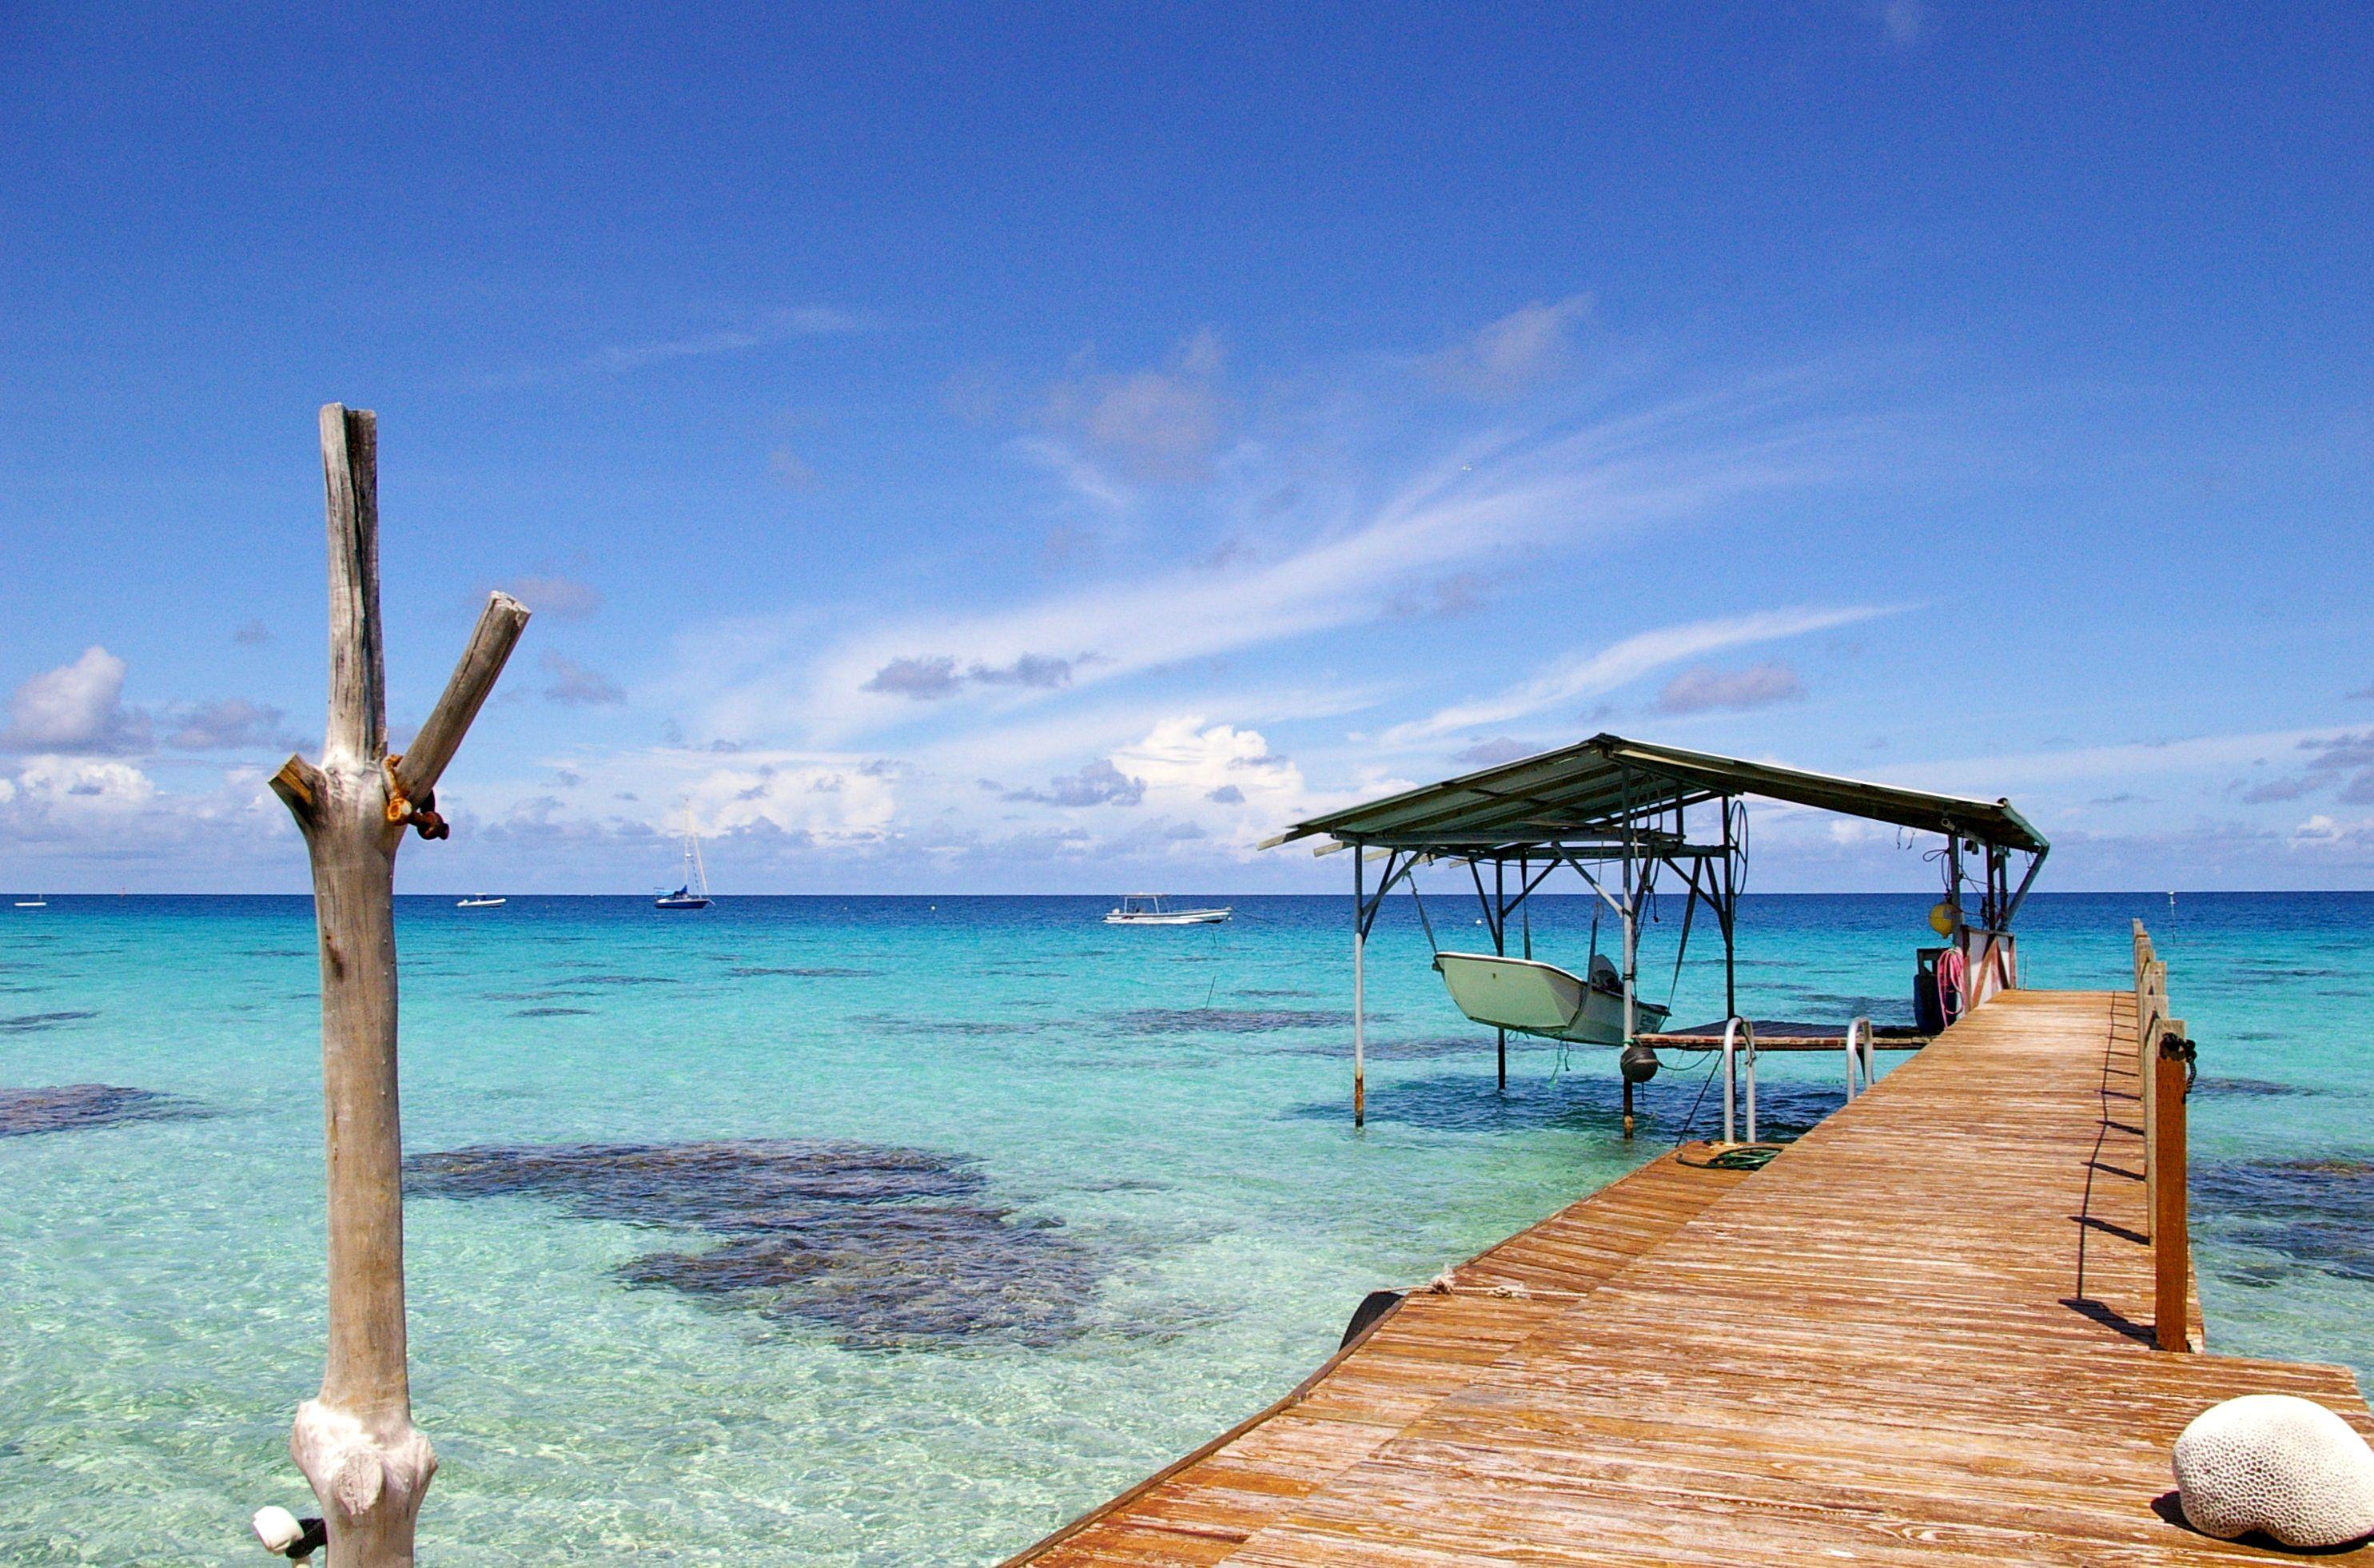 free screensavers beaches | honeymoon and romance | pinterest